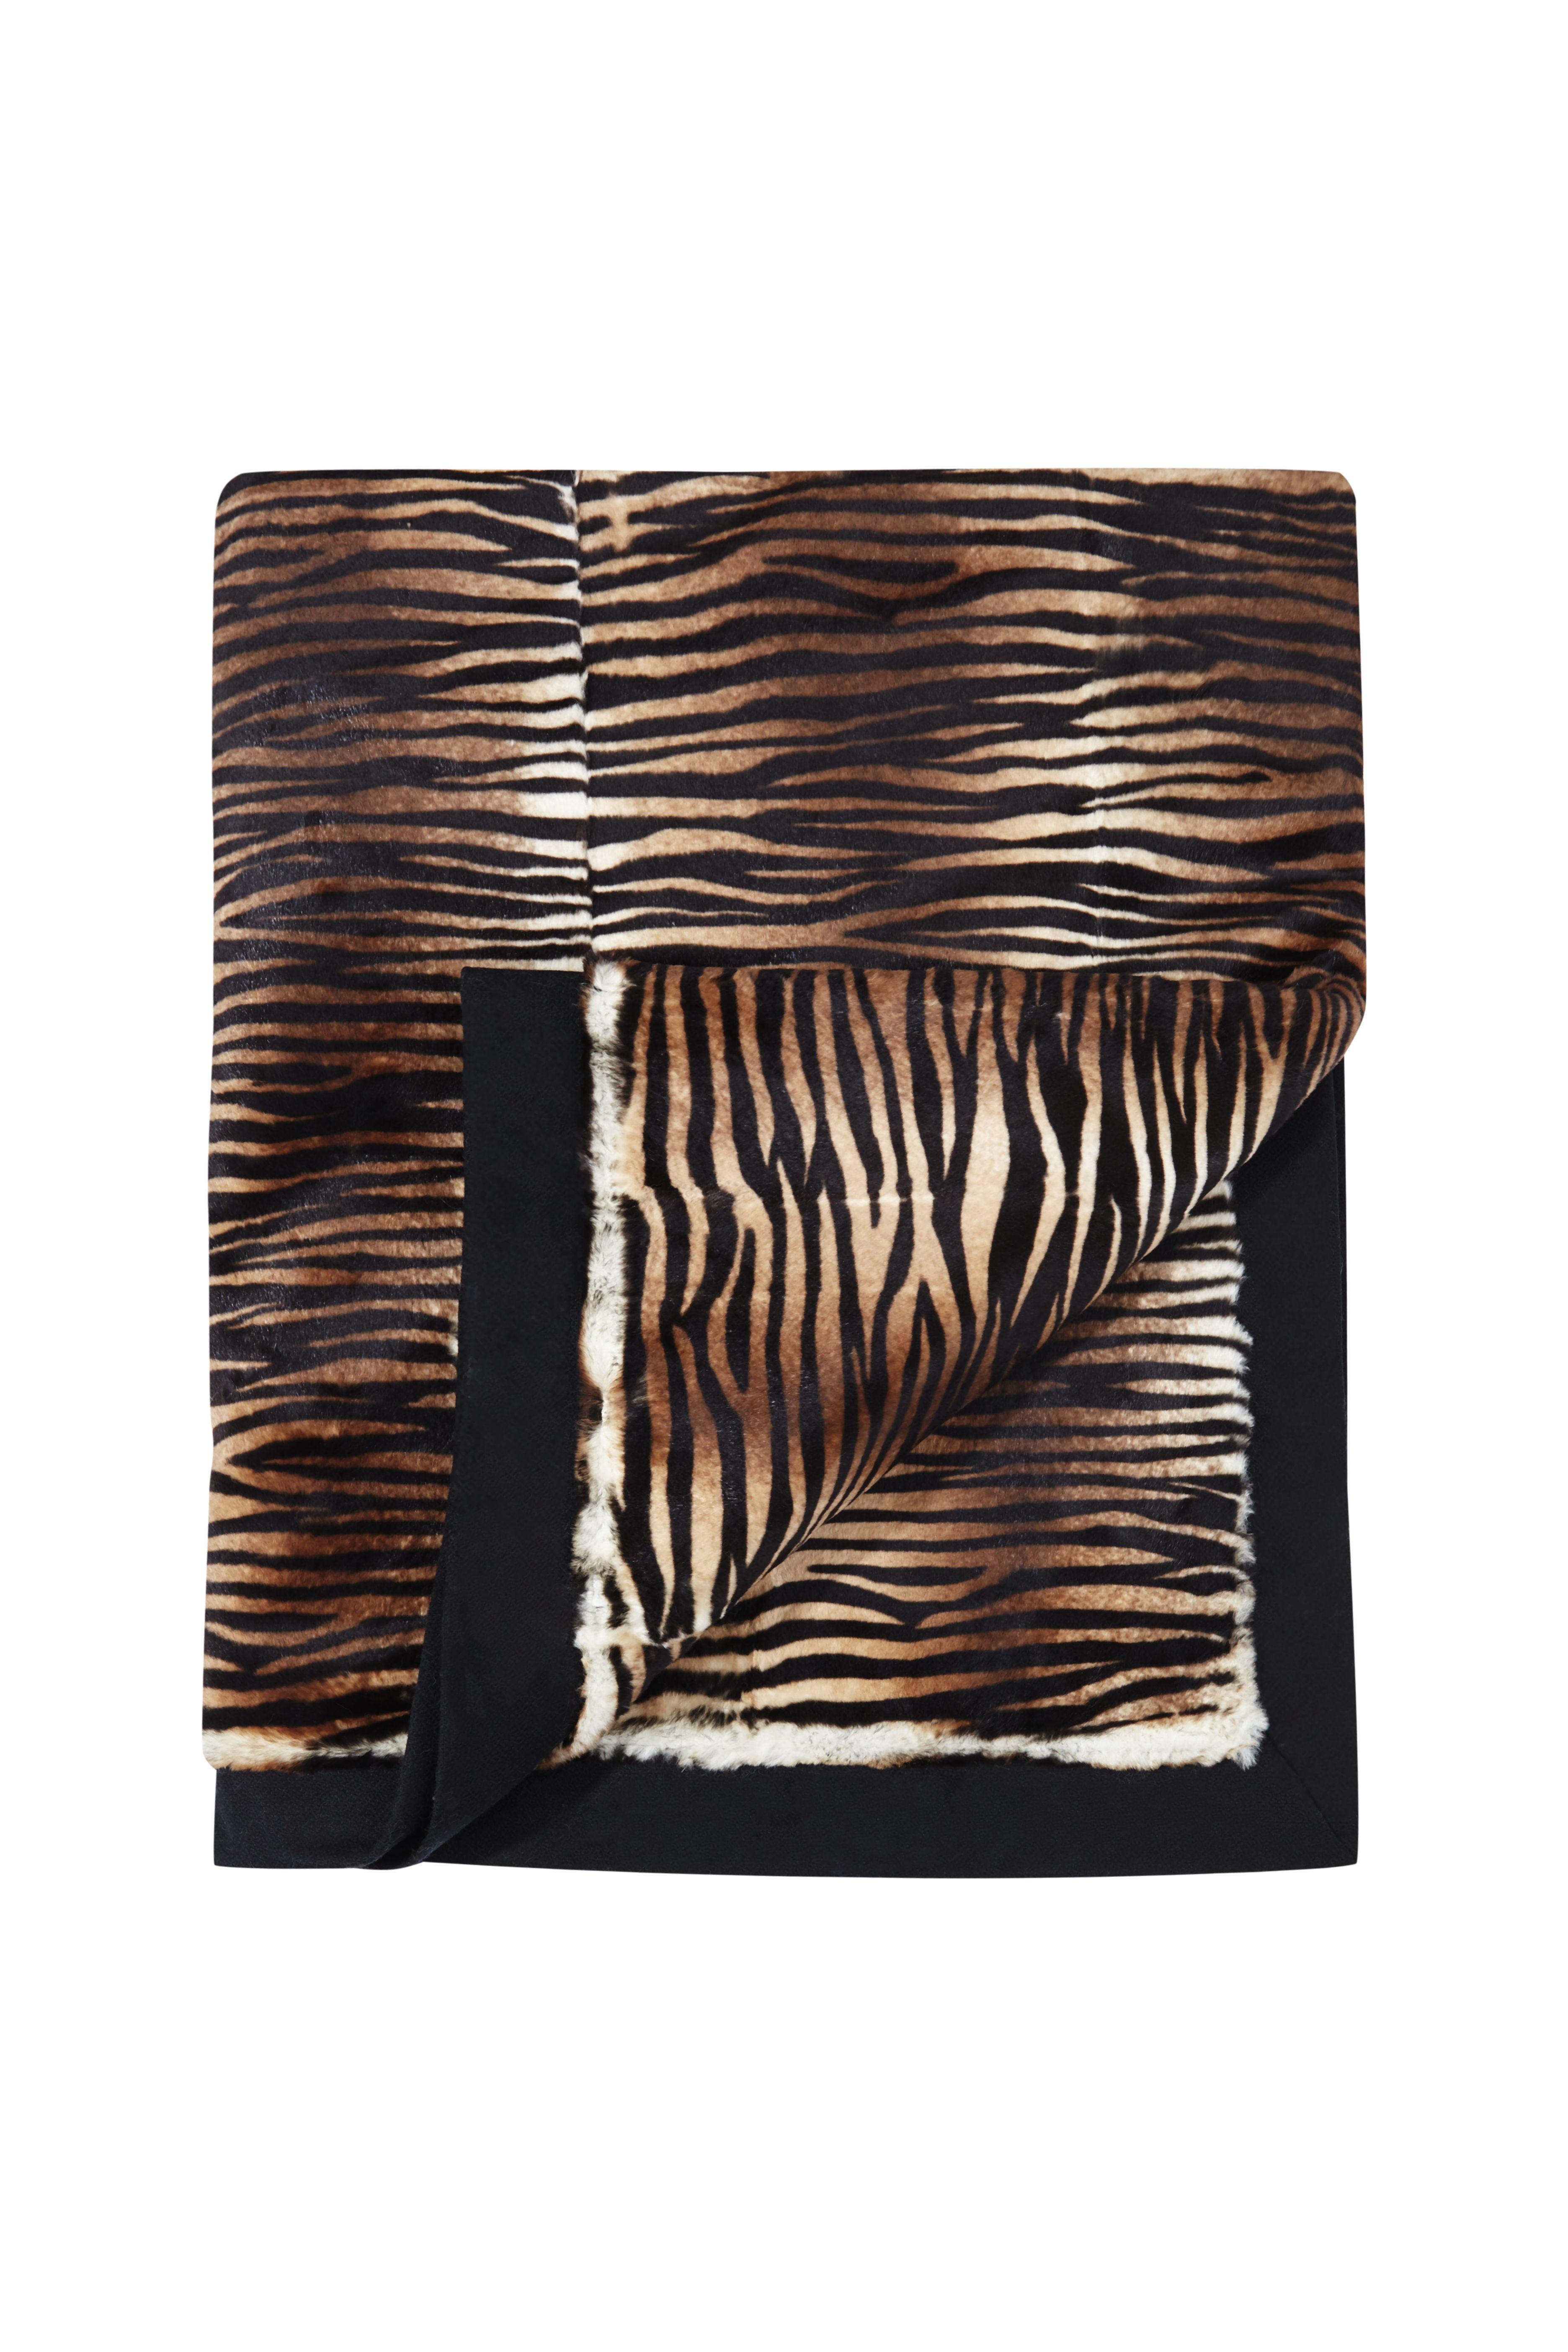 Alfombra animal print animal print carpet colecci n - Alfombras animal print ...